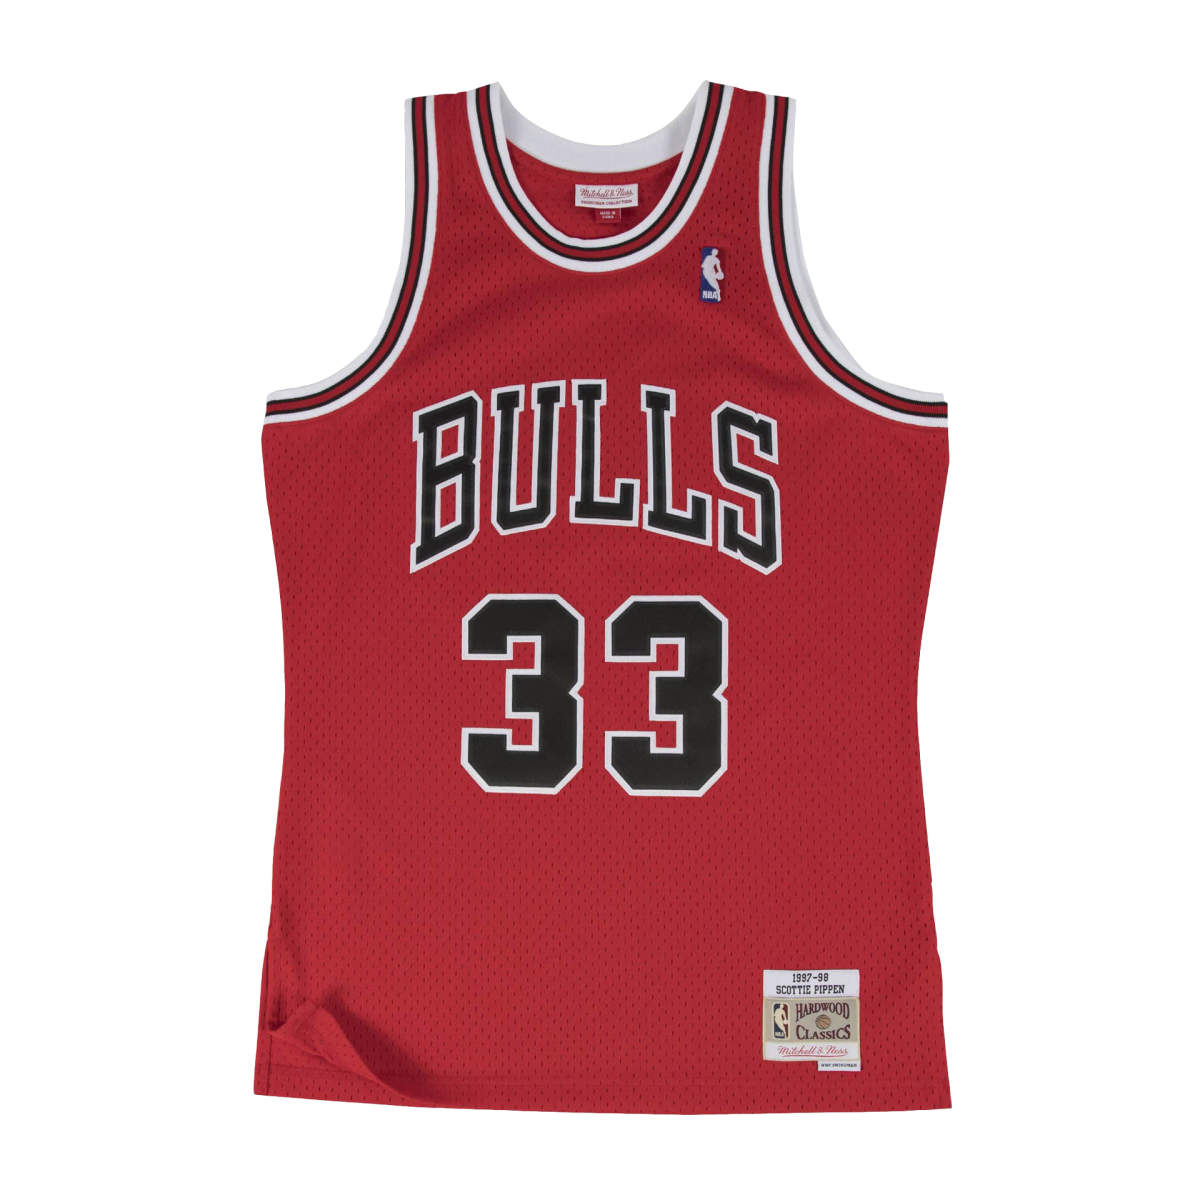 Chicago bulls away swingman jersey 1997-98 pippen